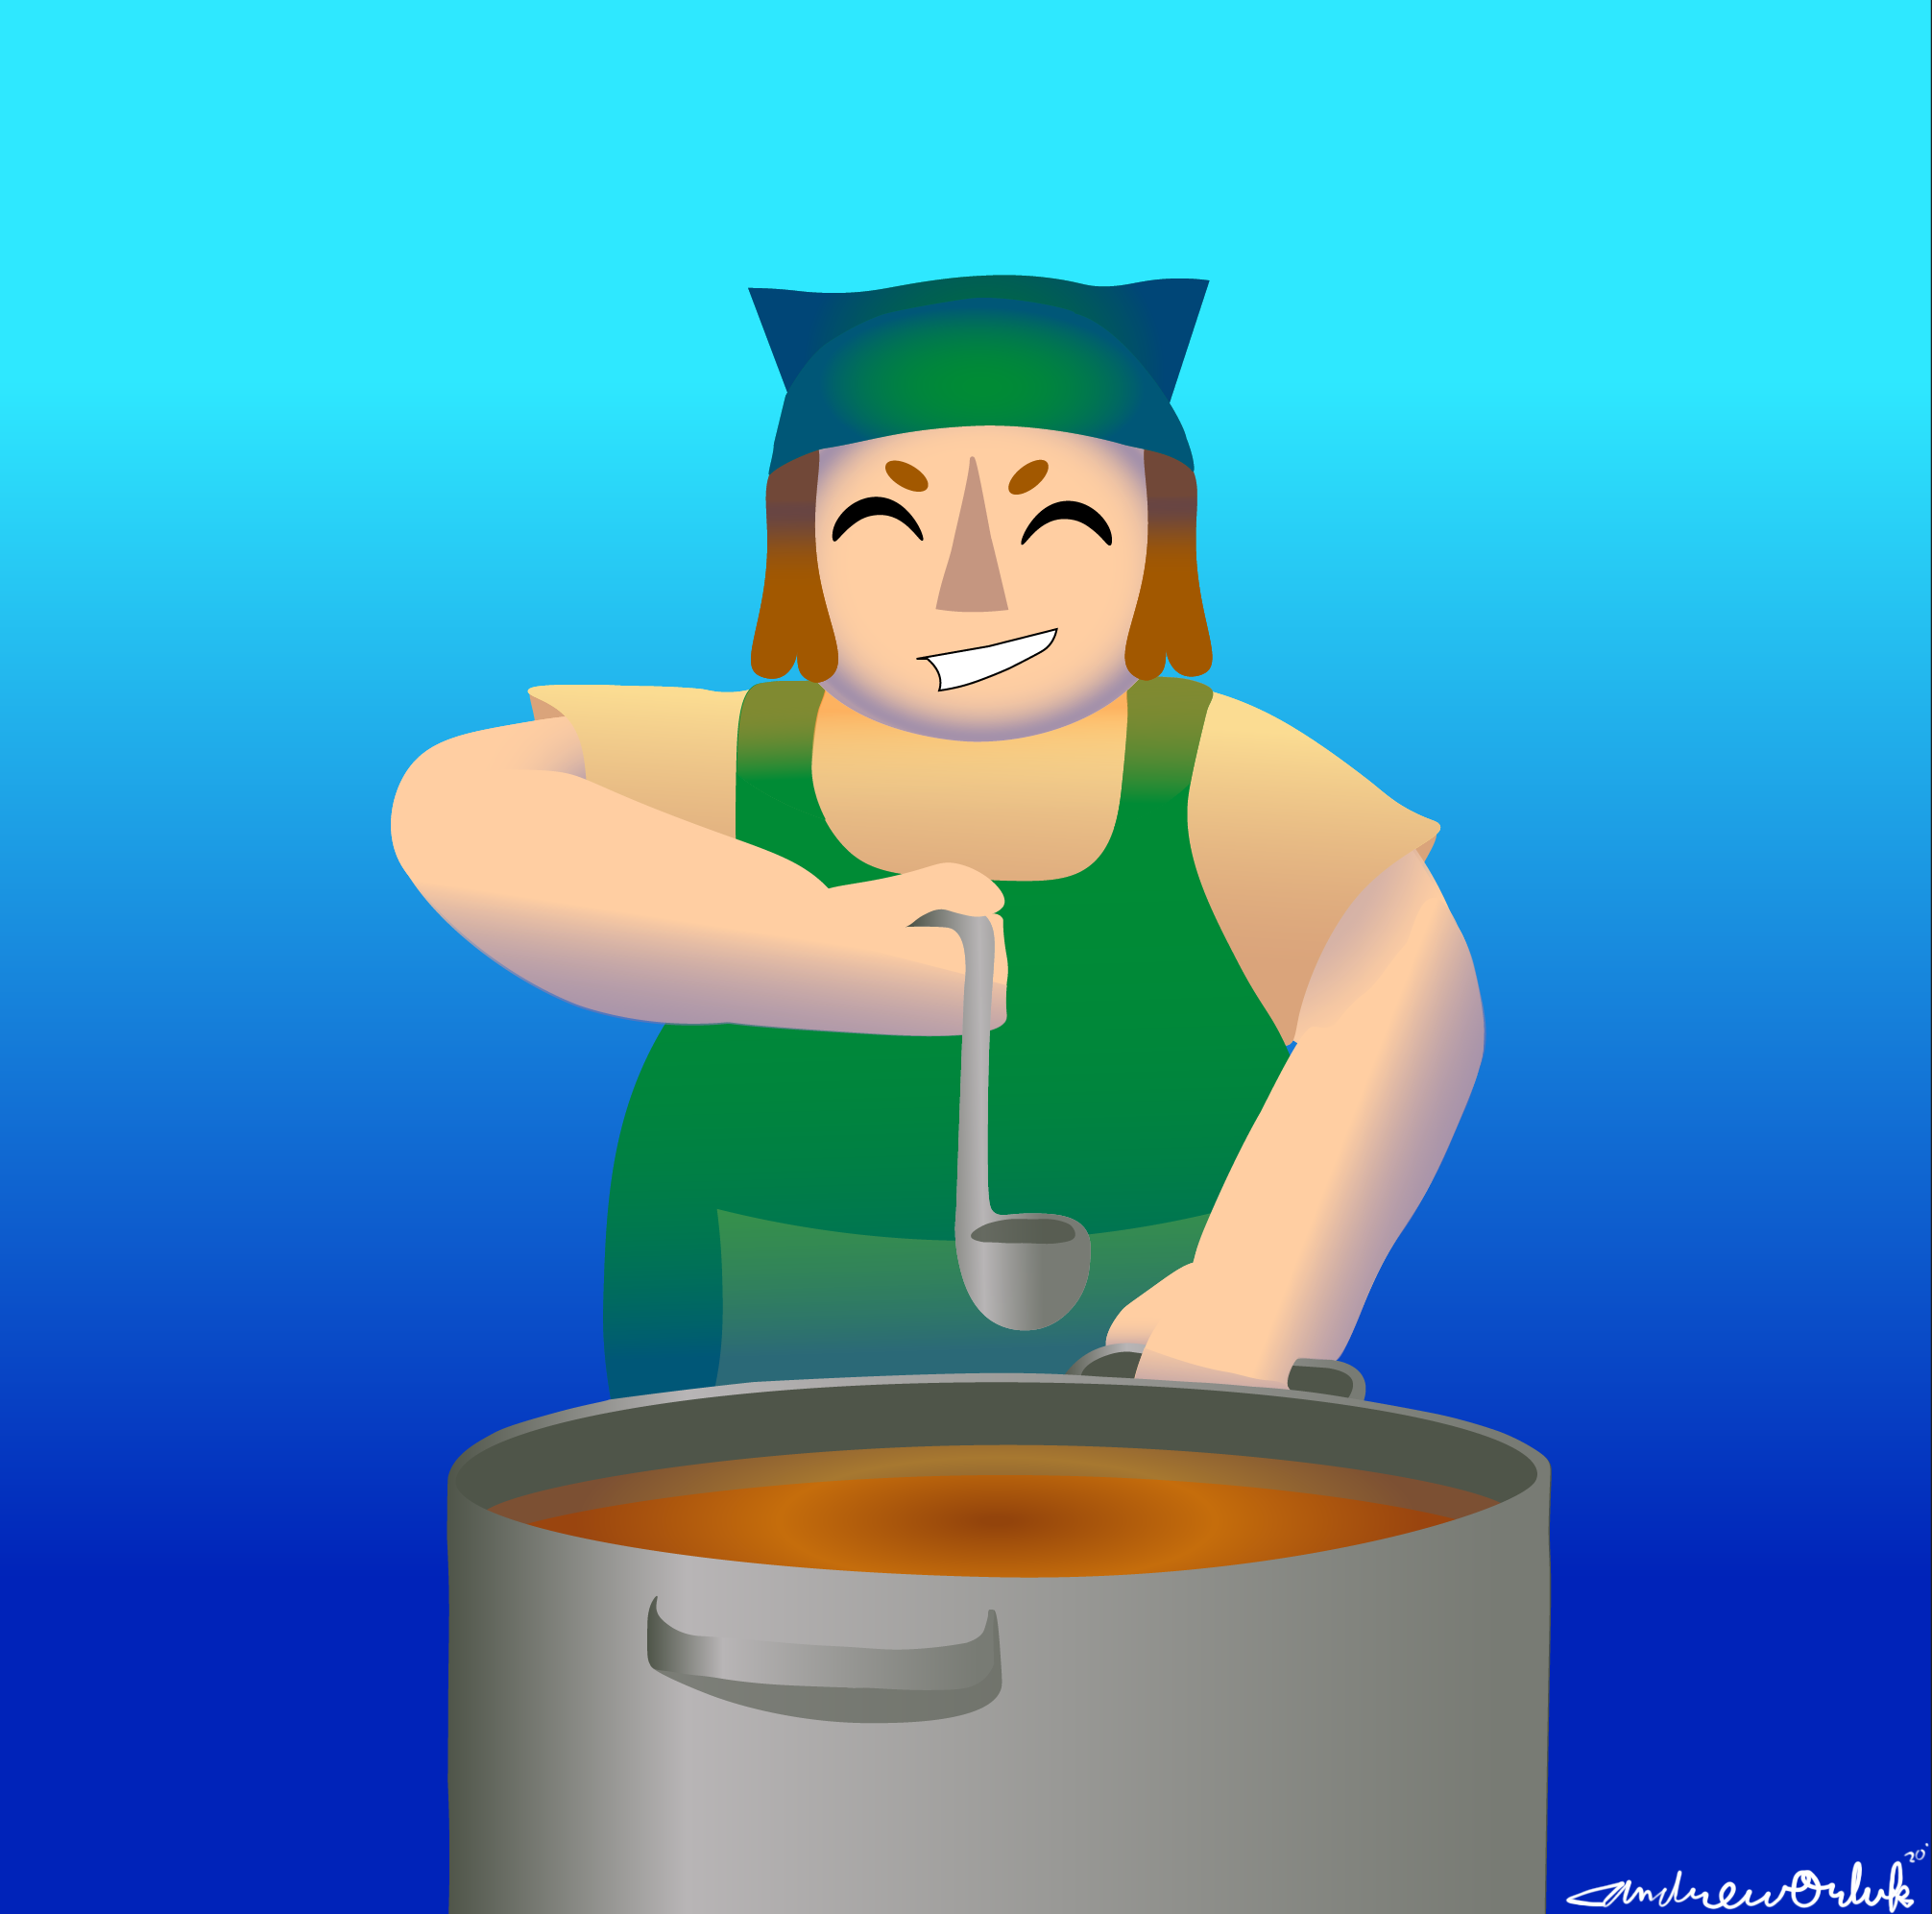 Soup-kitchen-graphic